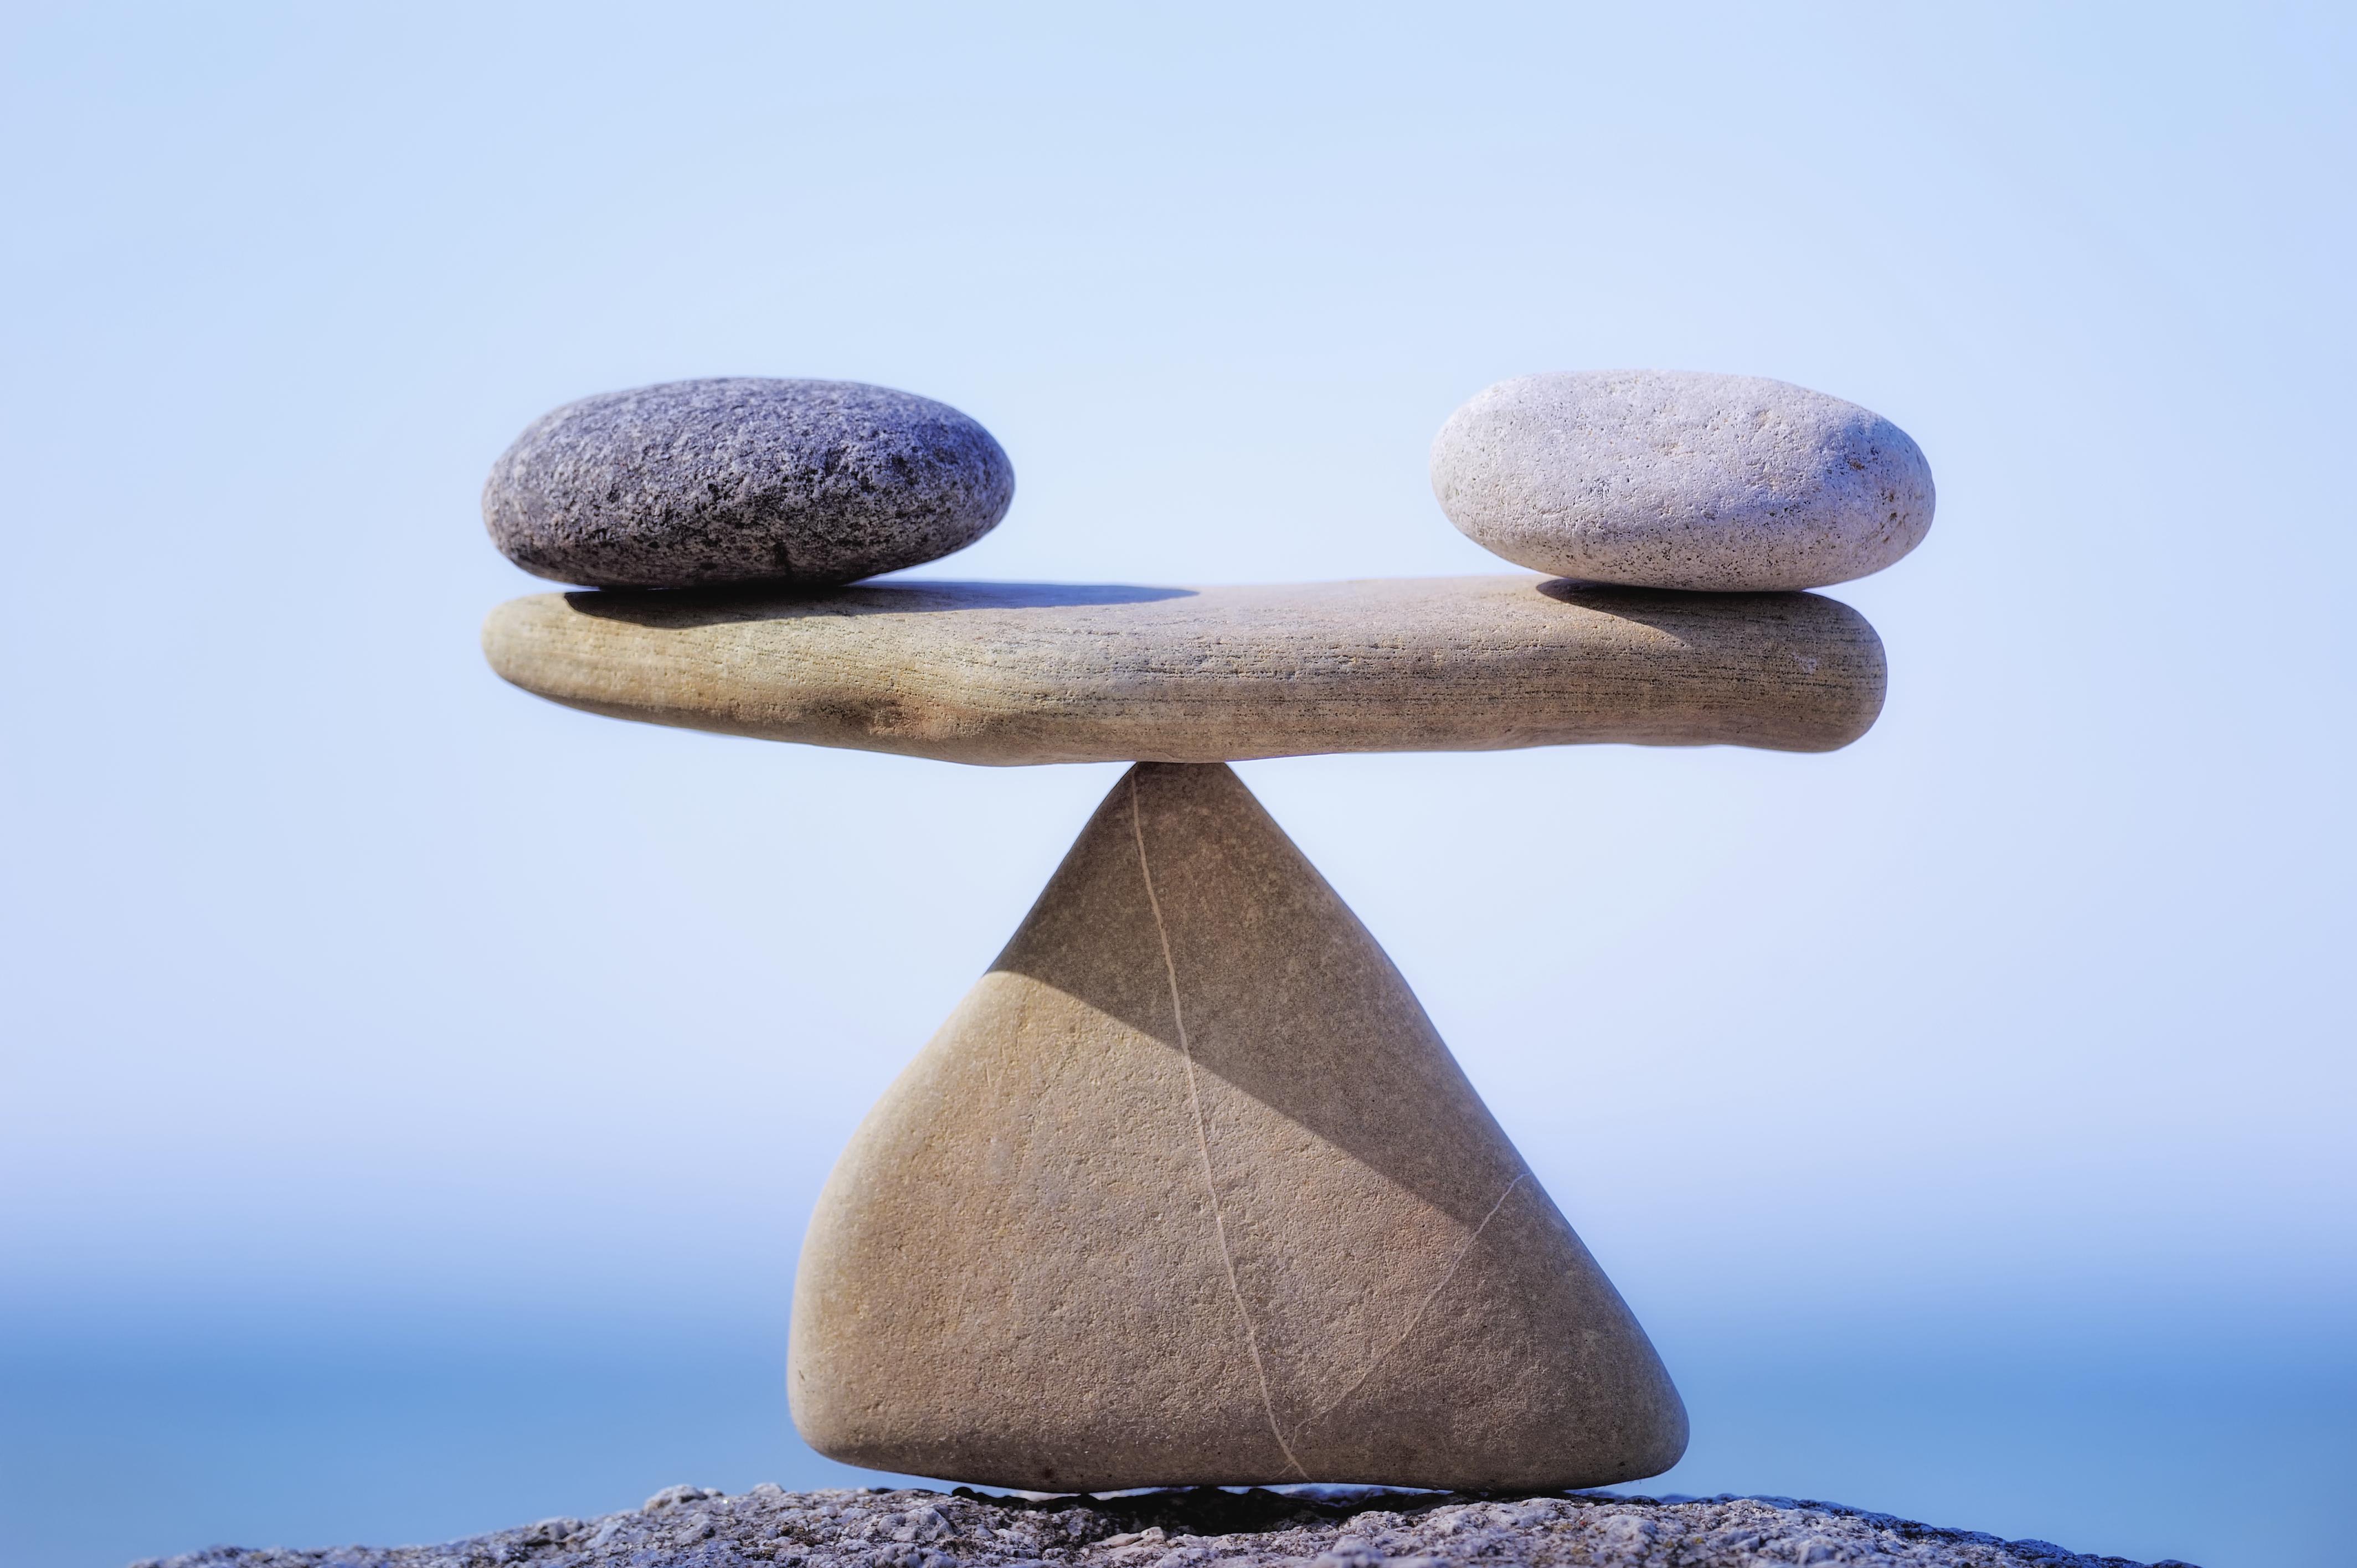 Life values balance